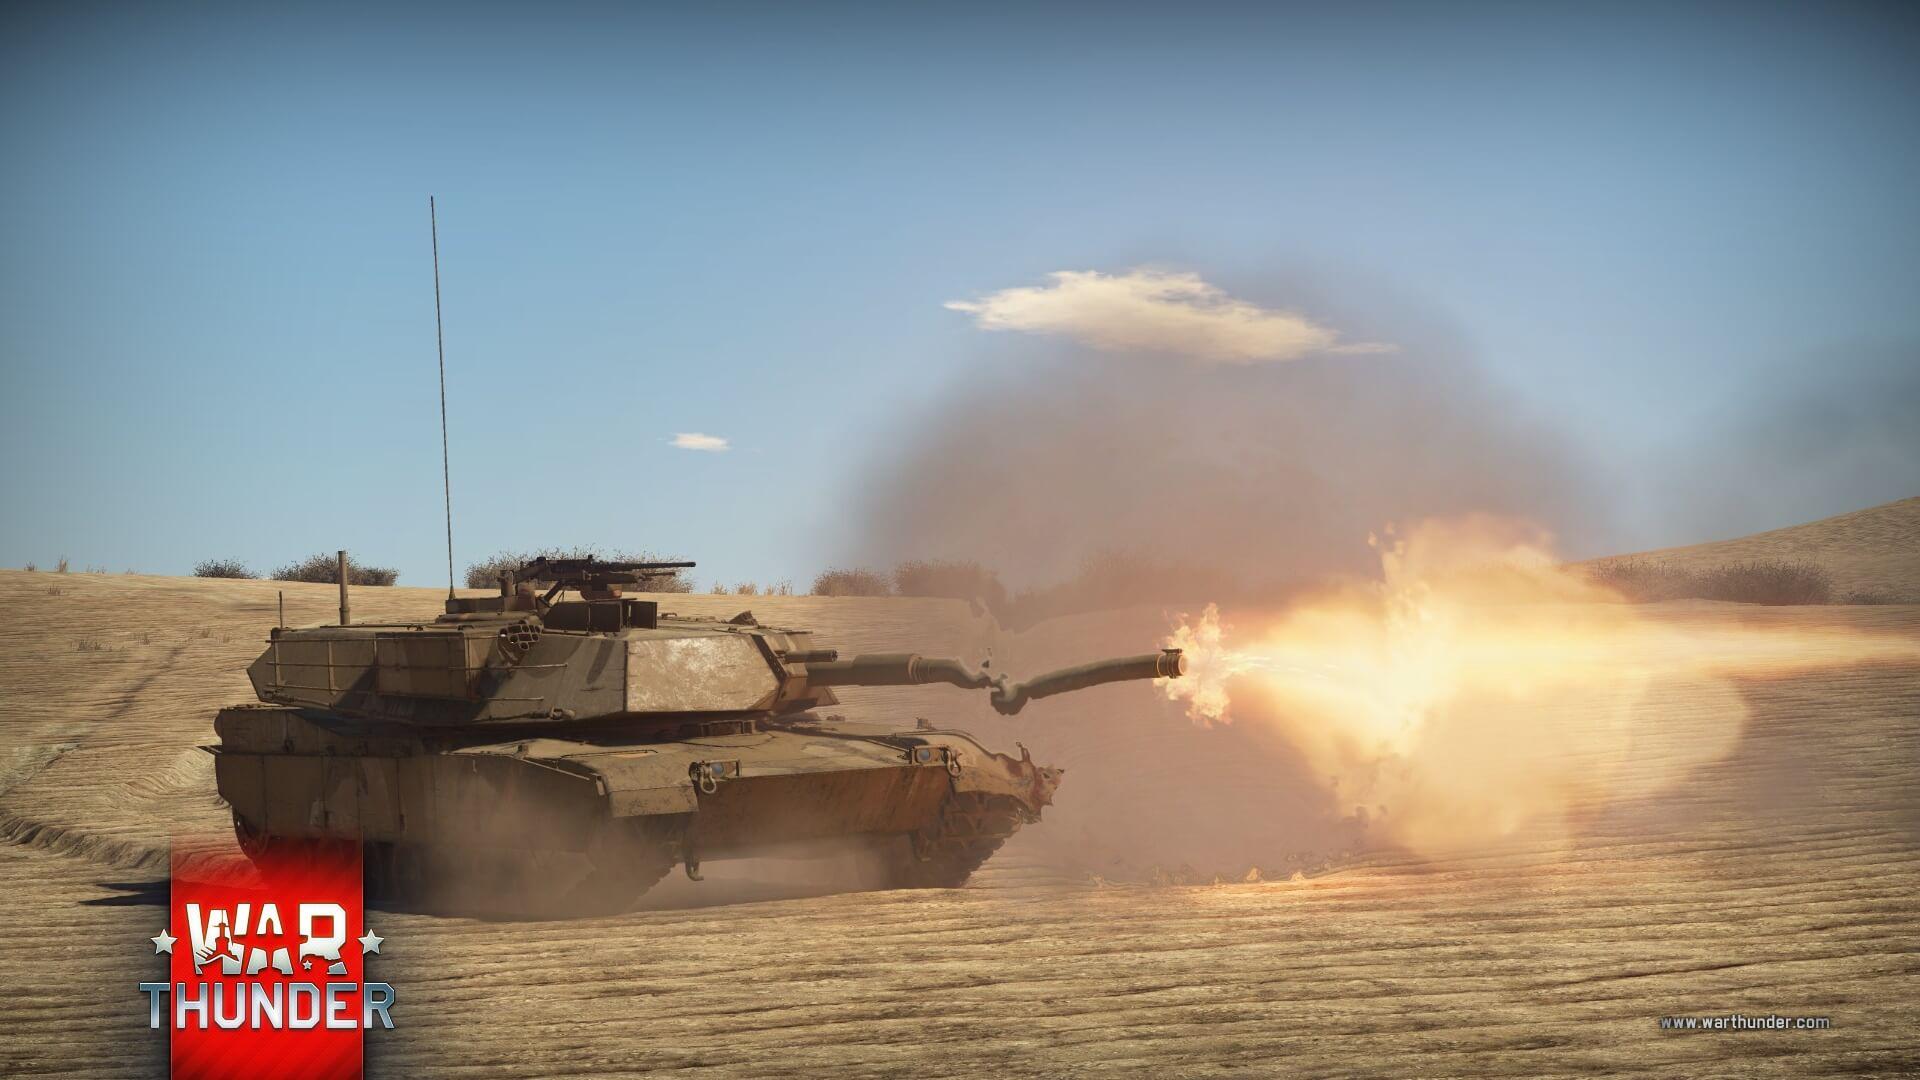 WarThunder_Update_177_M1_Abrams_2_EN.jpg